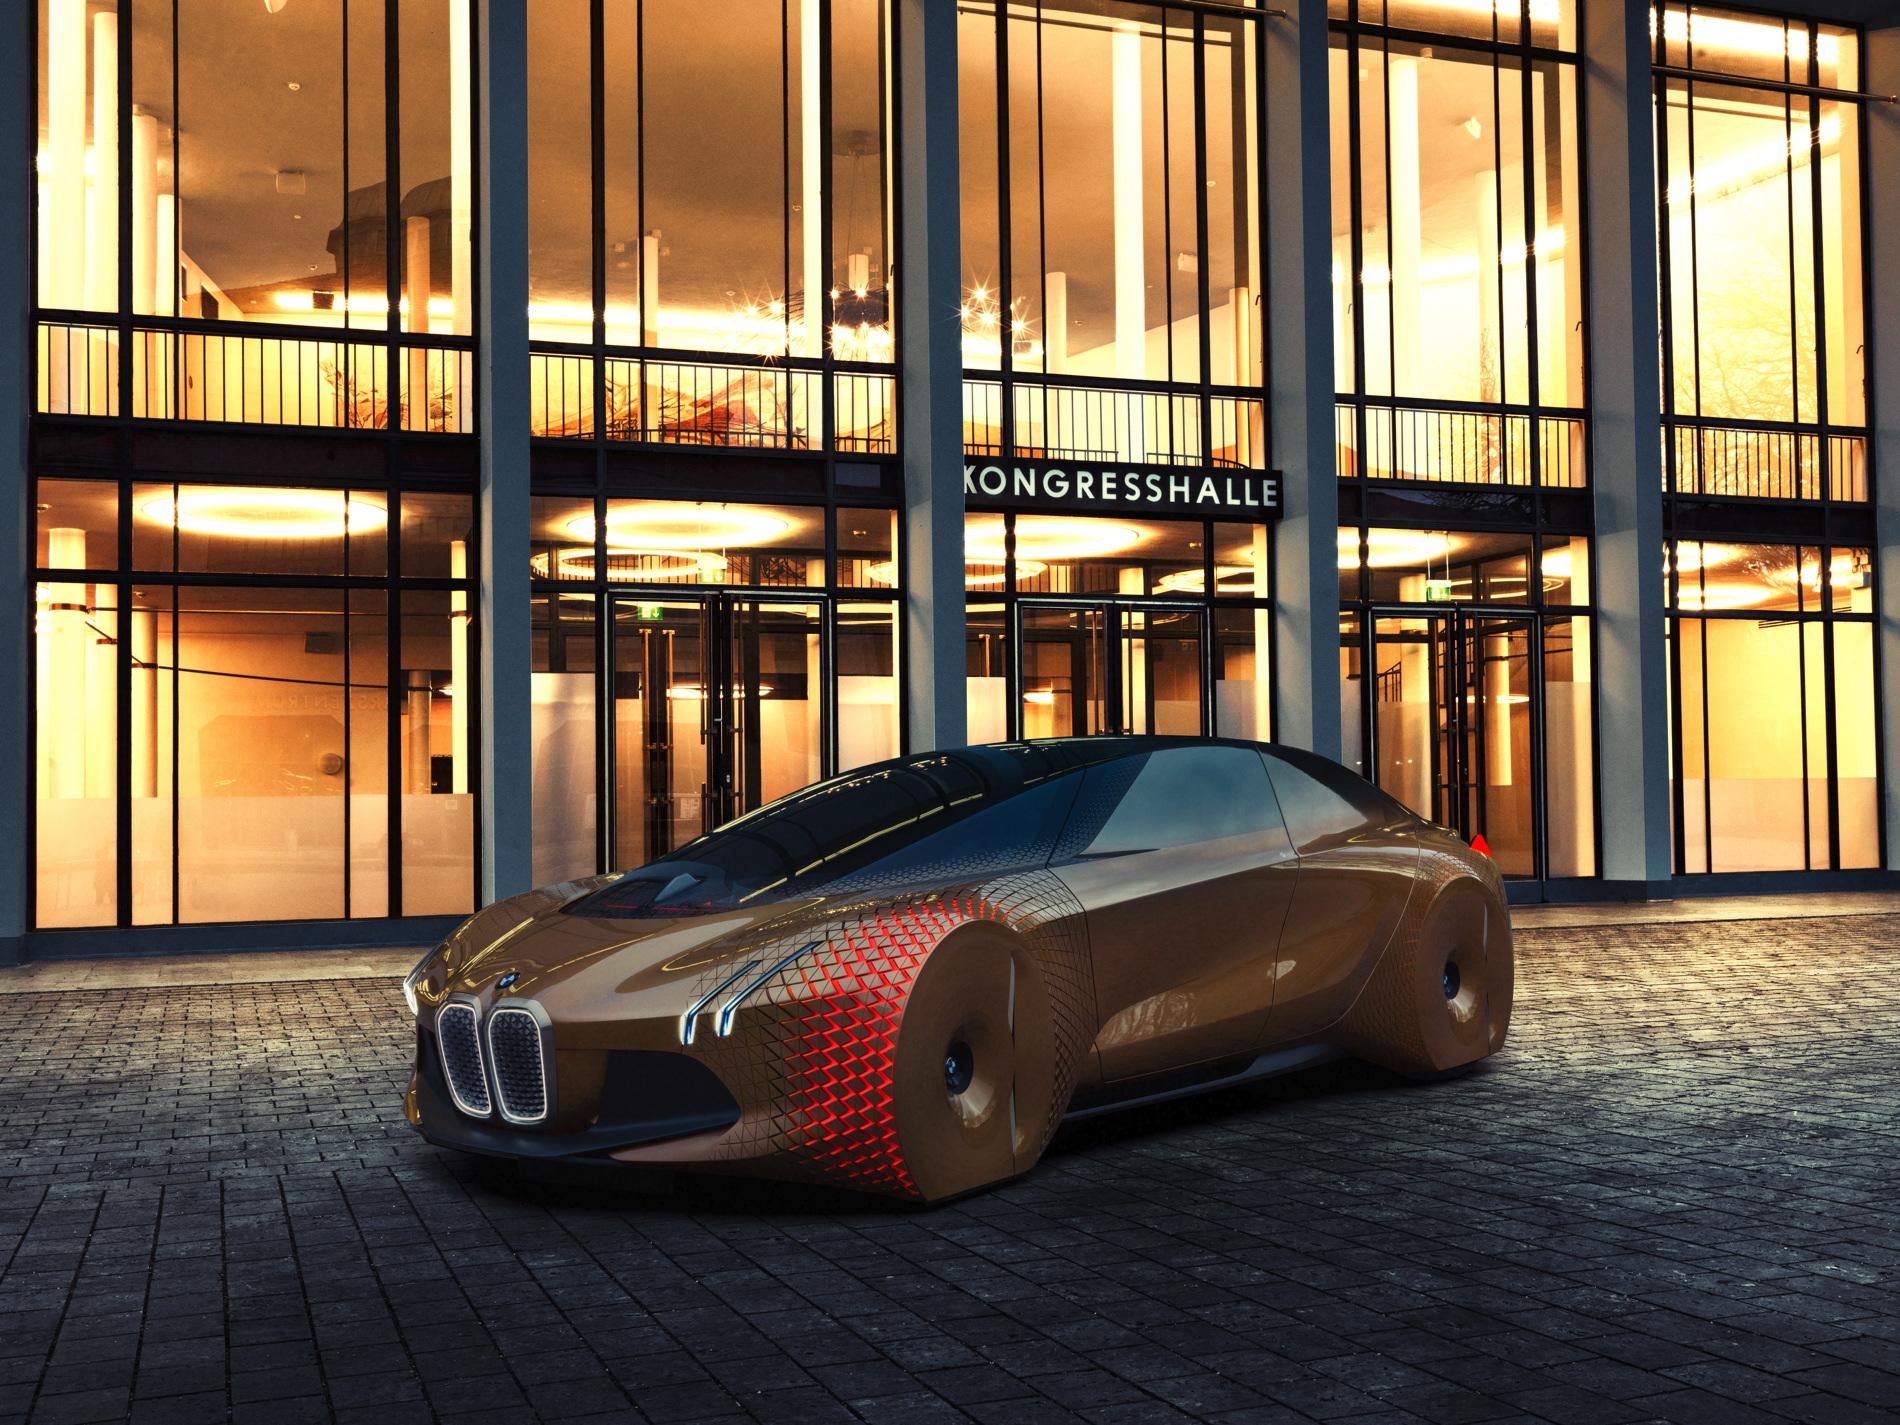 BMW Vision Next 100 images 137